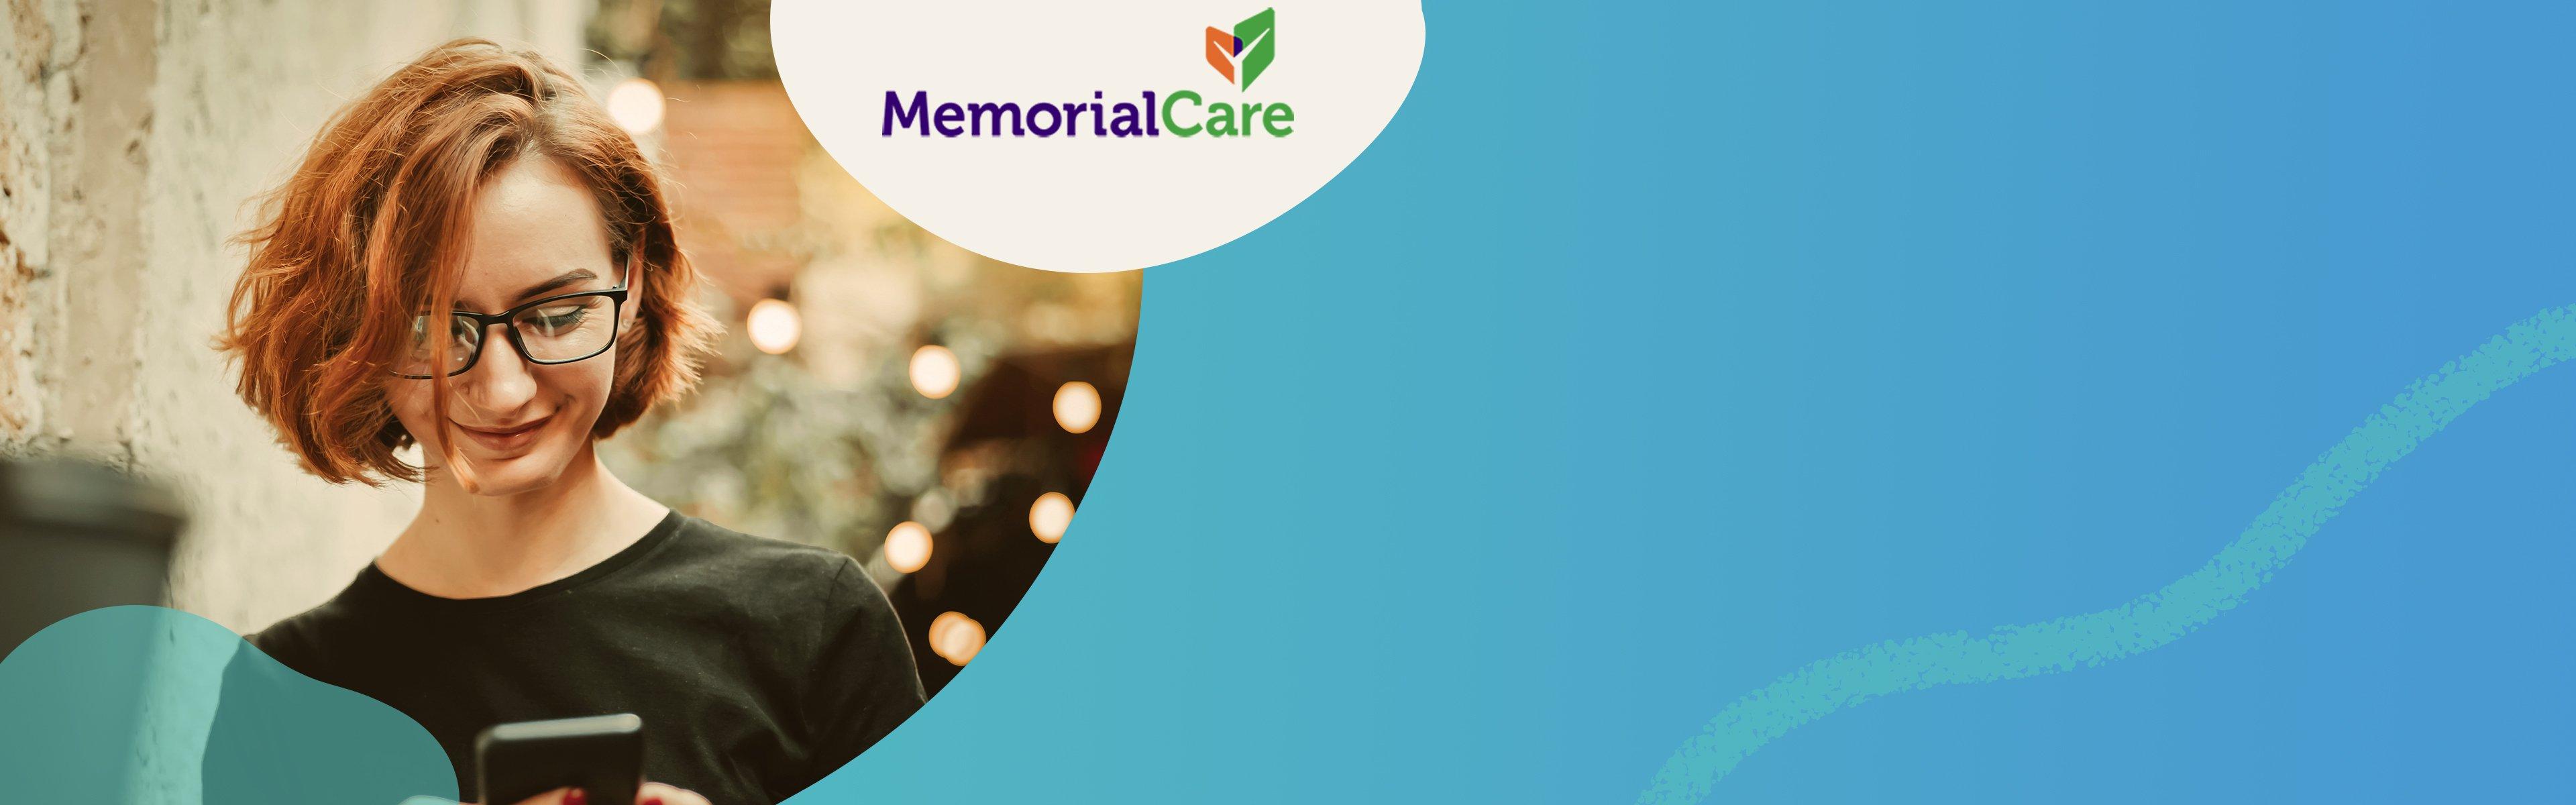 MemorialCare-Homepage Banner2